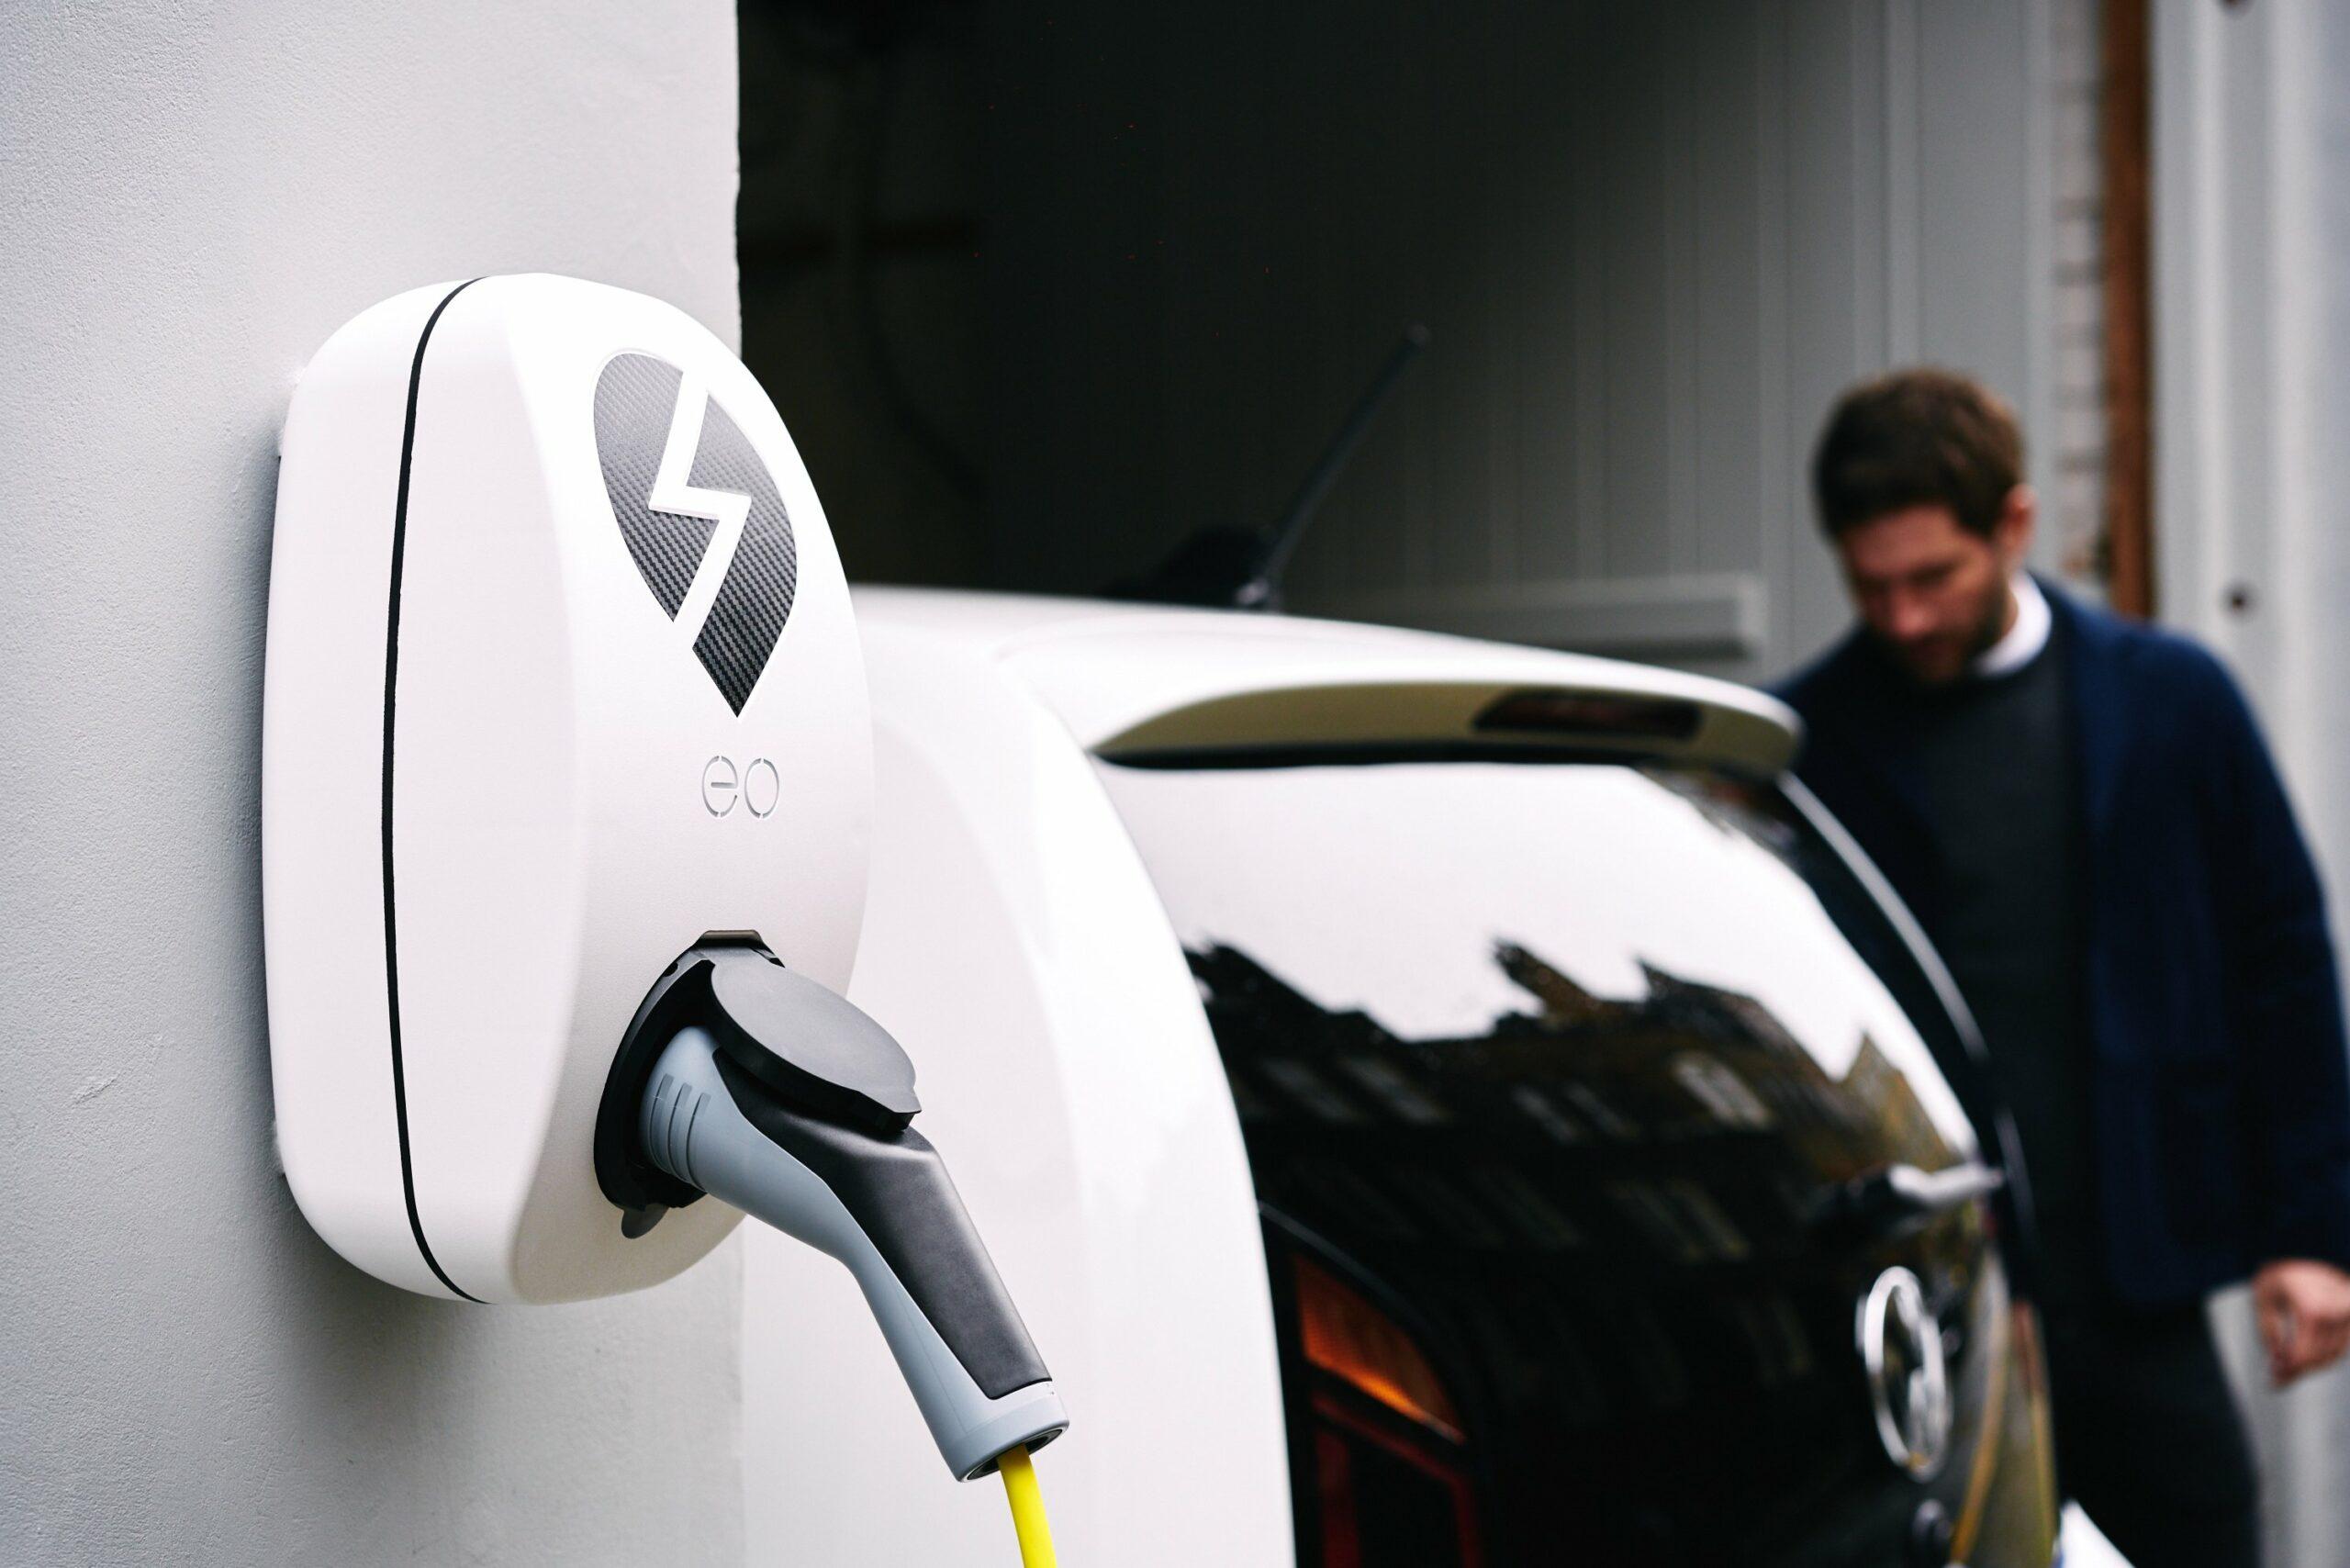 EO Genius EV Charging - Downtown Electrical